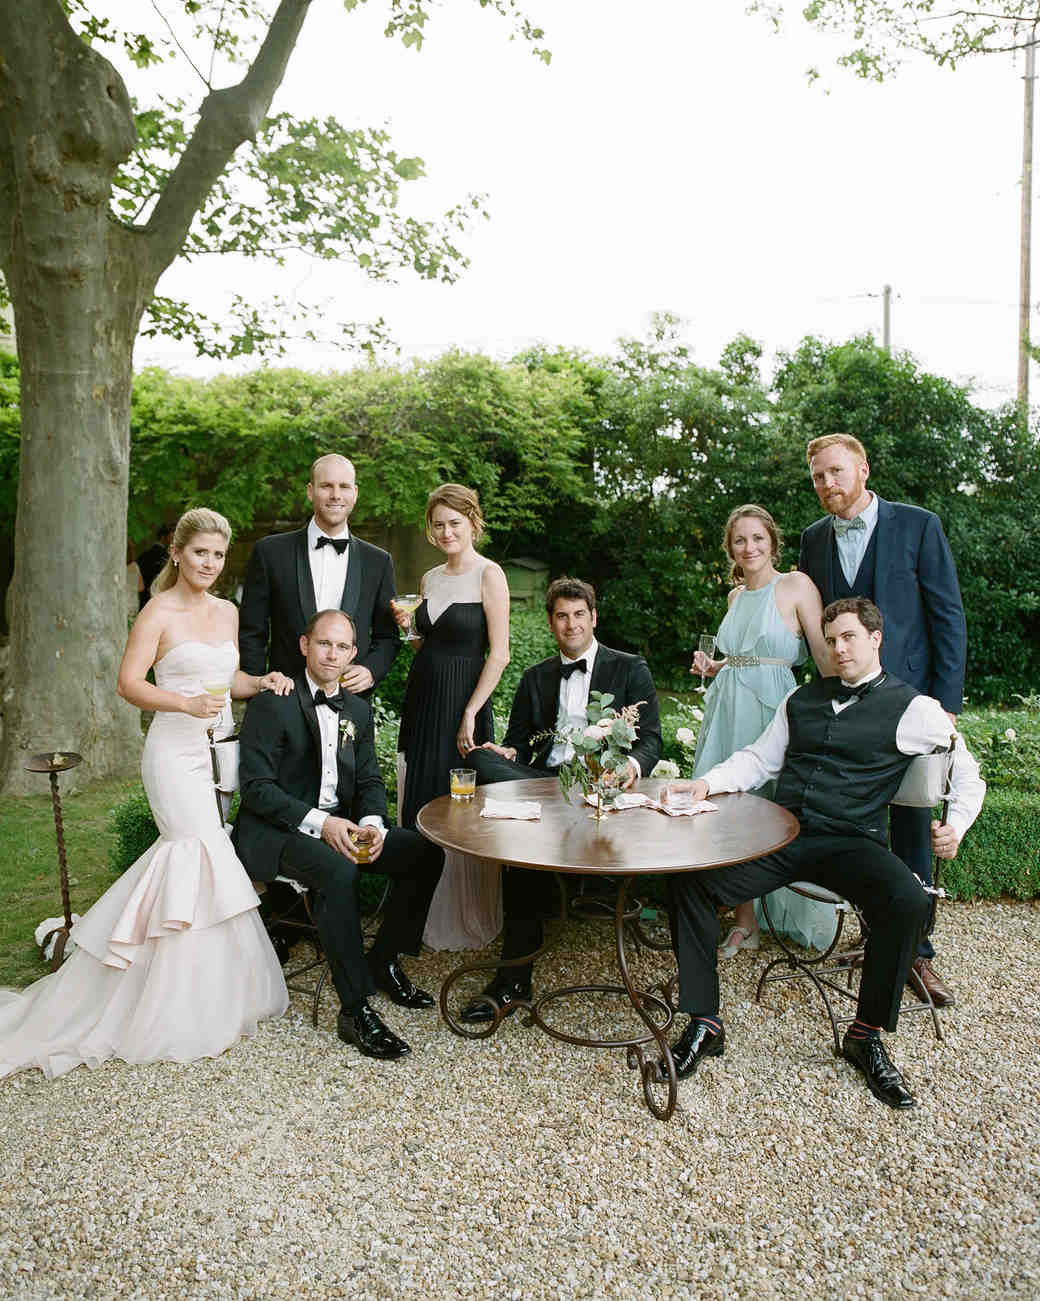 julie-chris-wedding-group-1318-s12649-0216.jpg